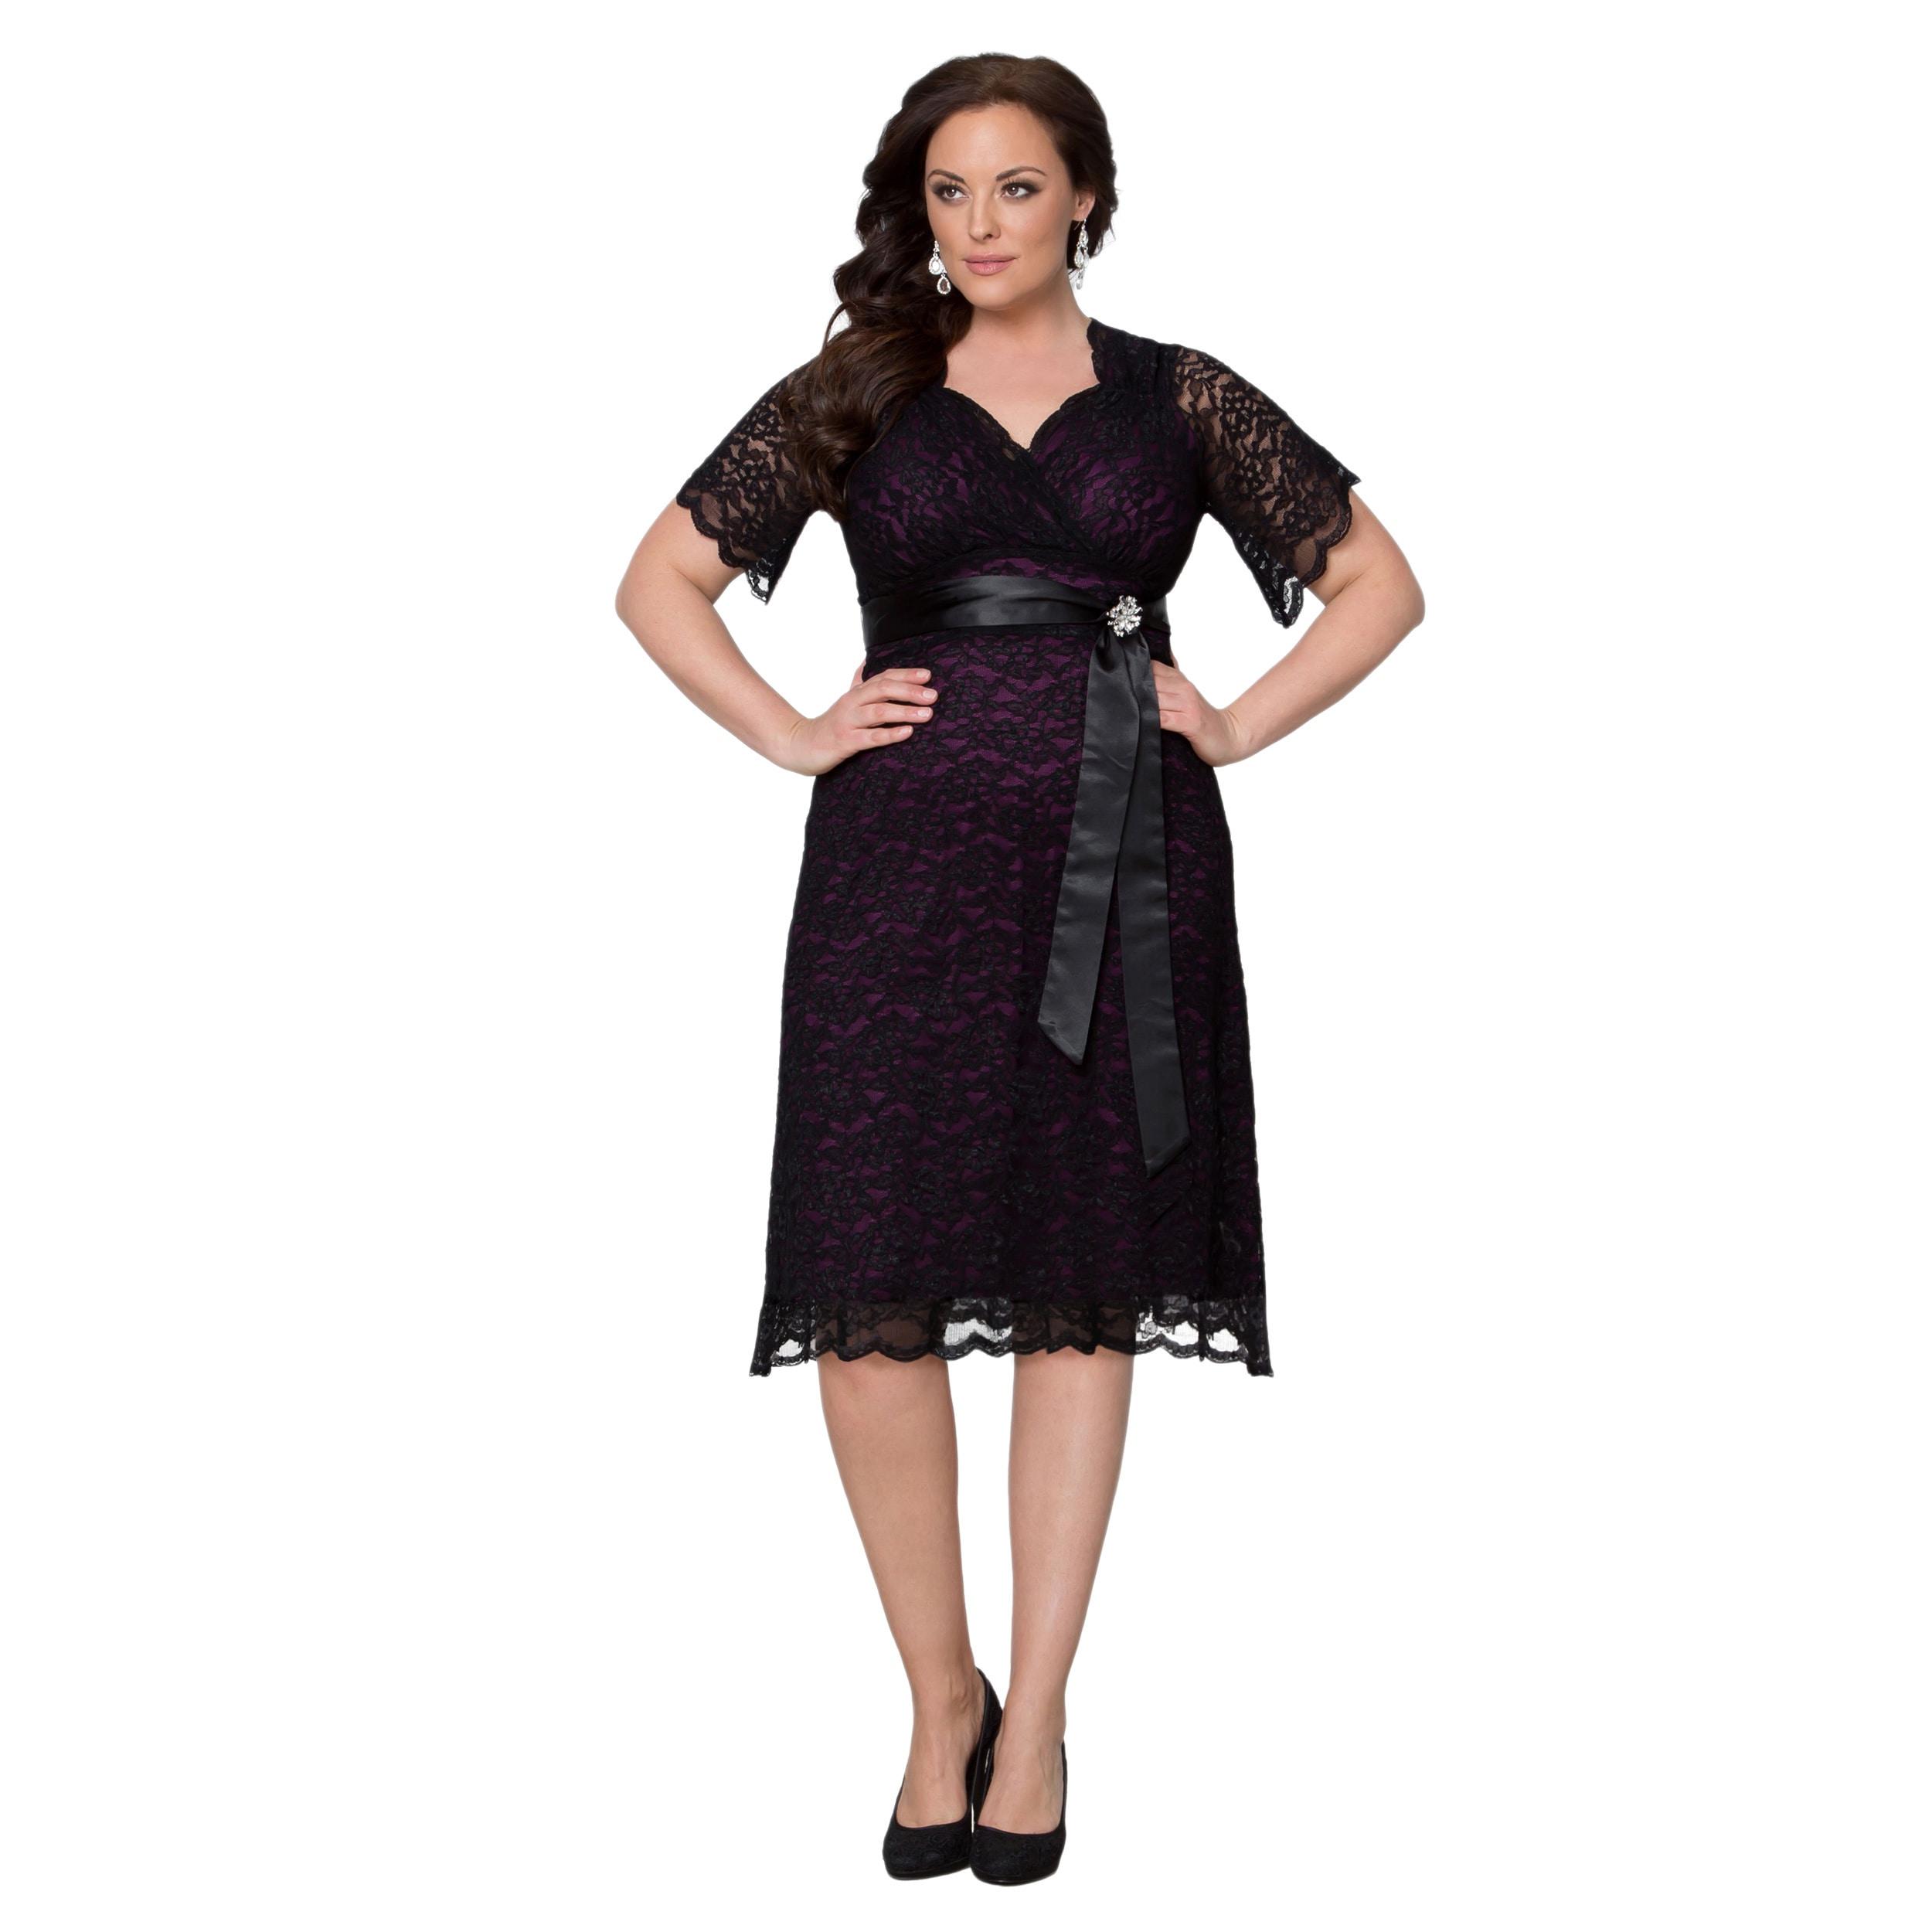 Kiyonna Clothing Women\'s Plus Size Retro Glam Dress